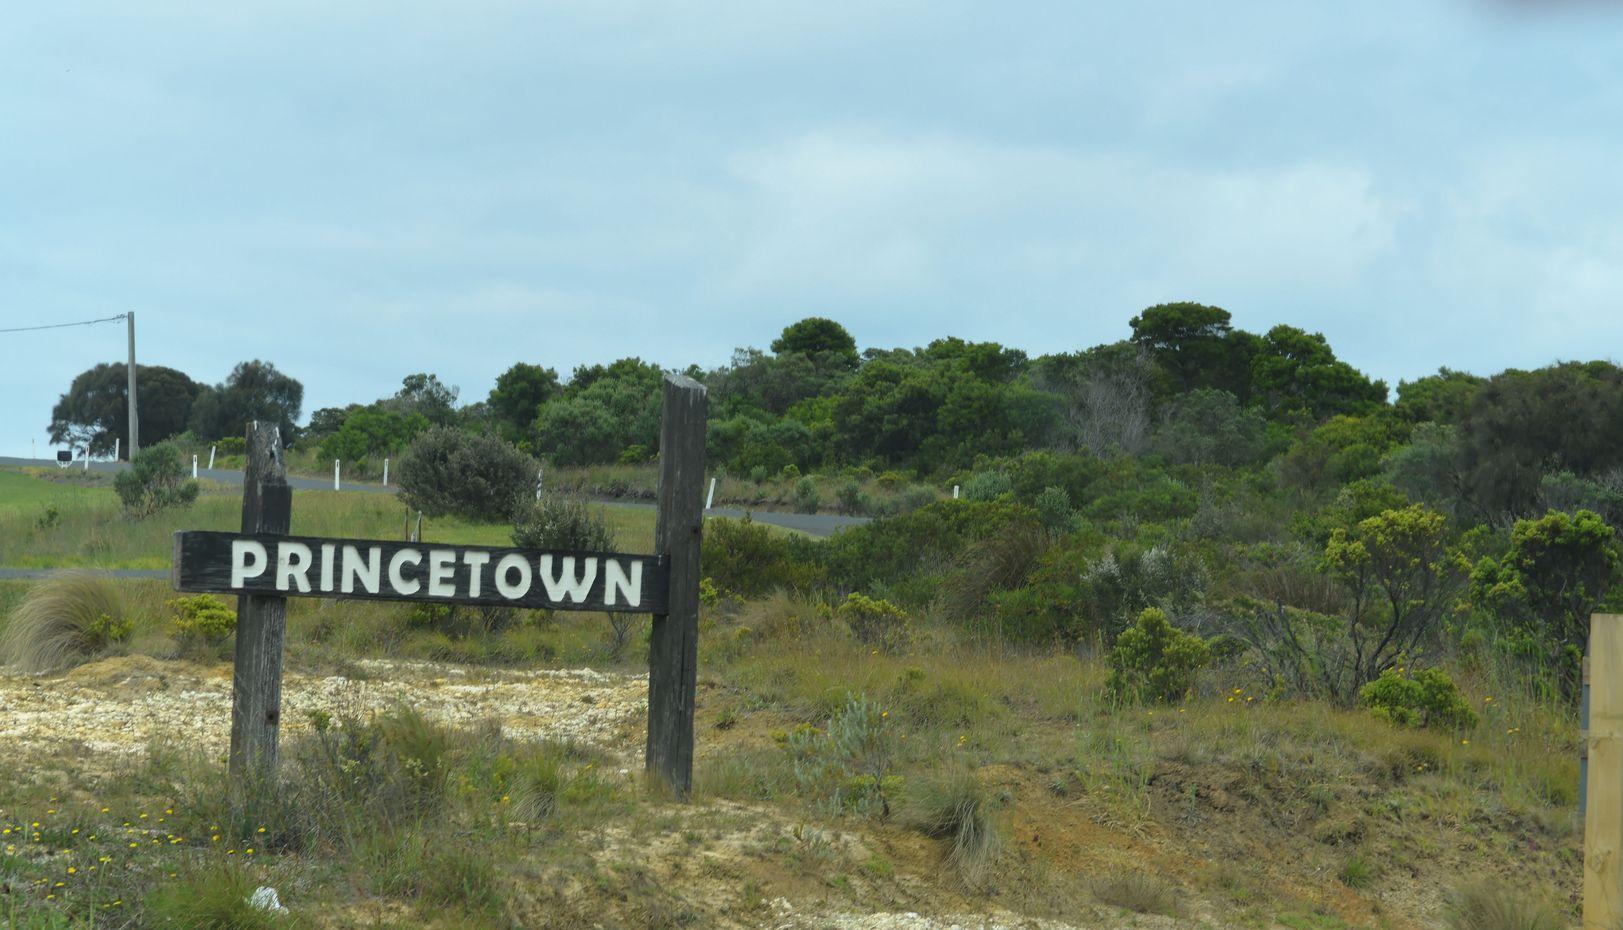 princetown entree